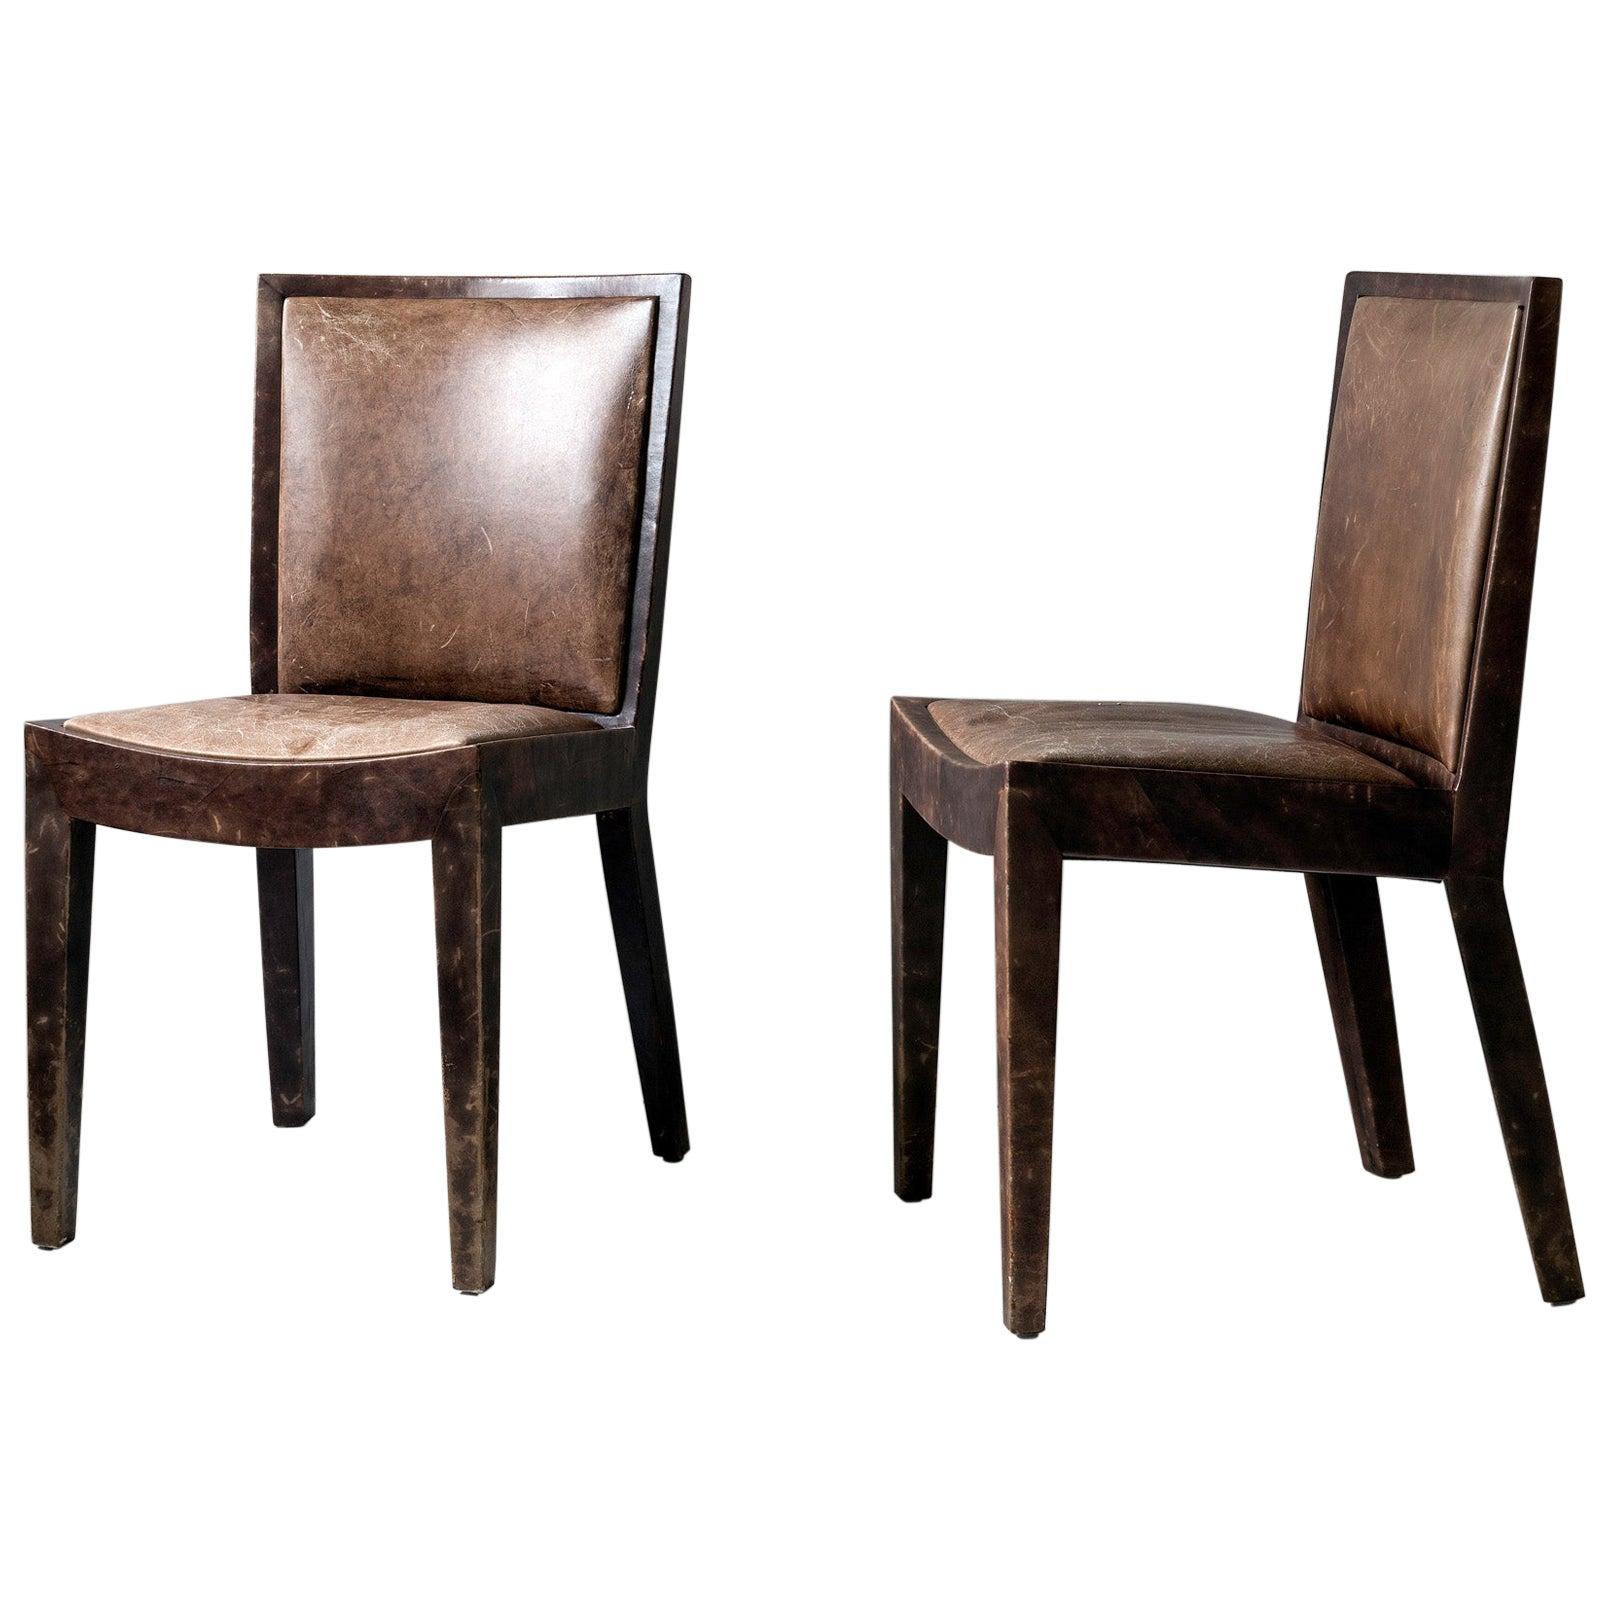 Chic Pair of Original Karl Springer JMF Chairs in Goatskin